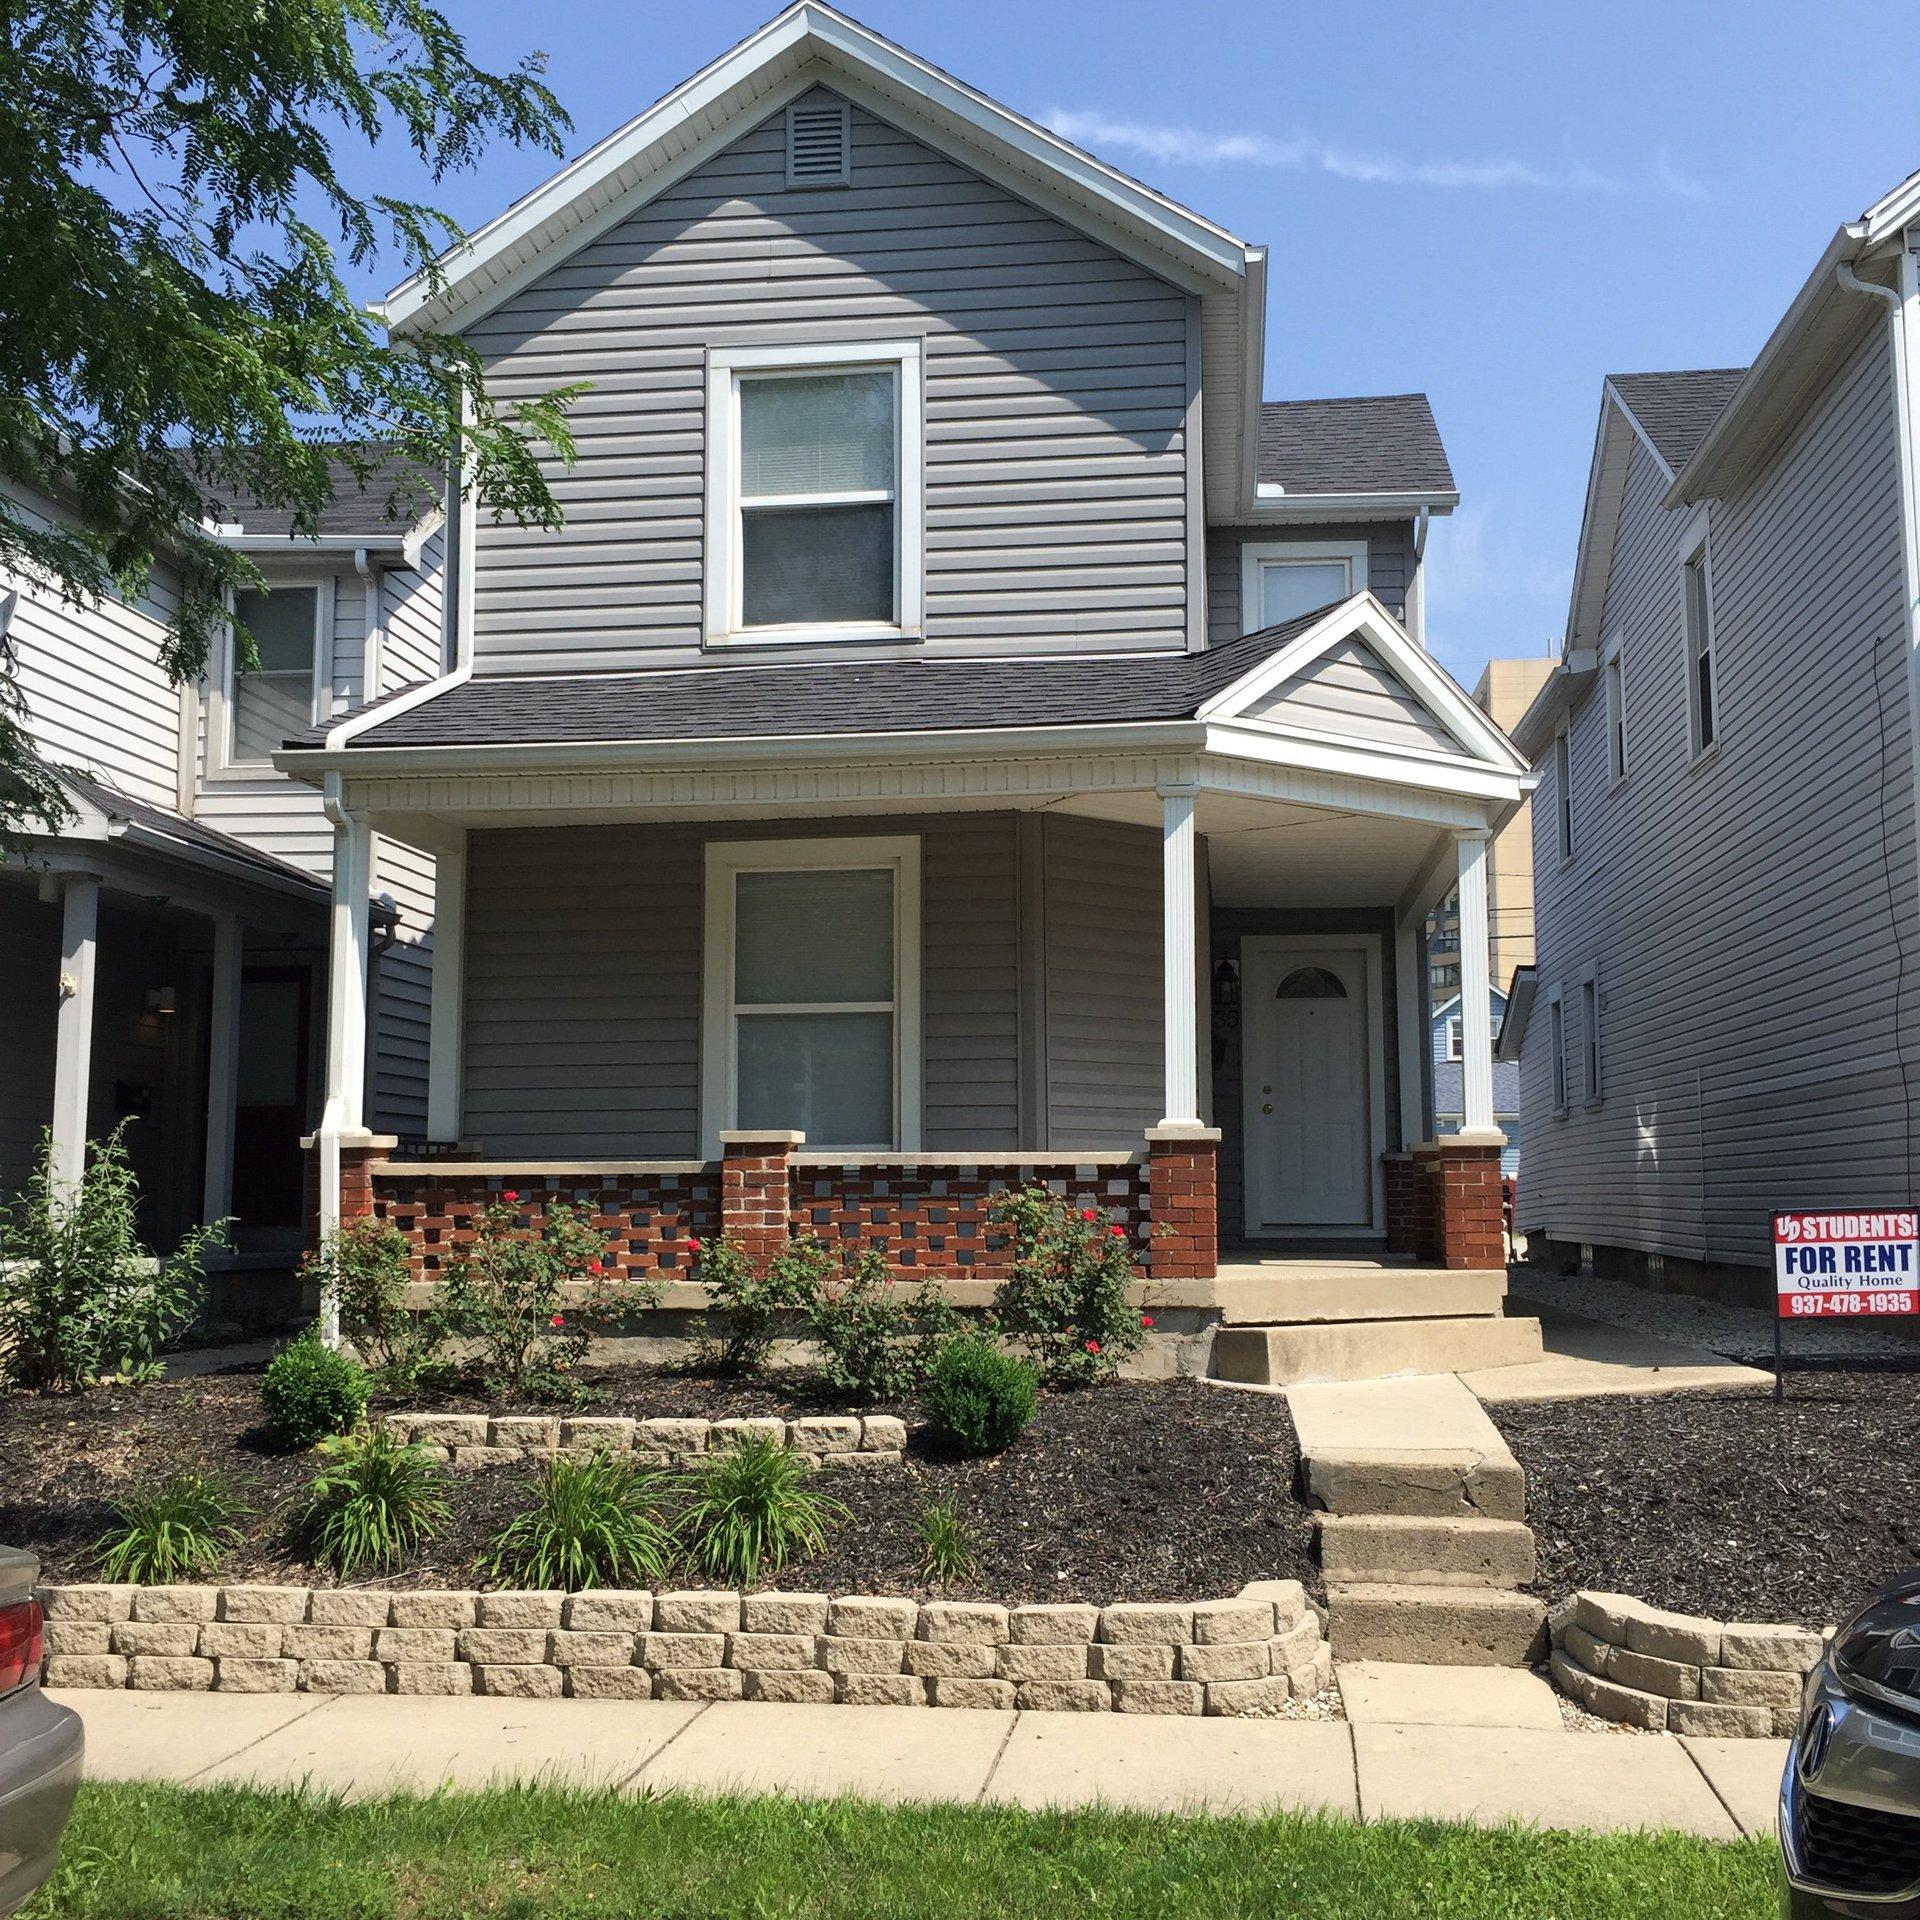 3 Benefits Of Landlord Housing At The University Of Dayton